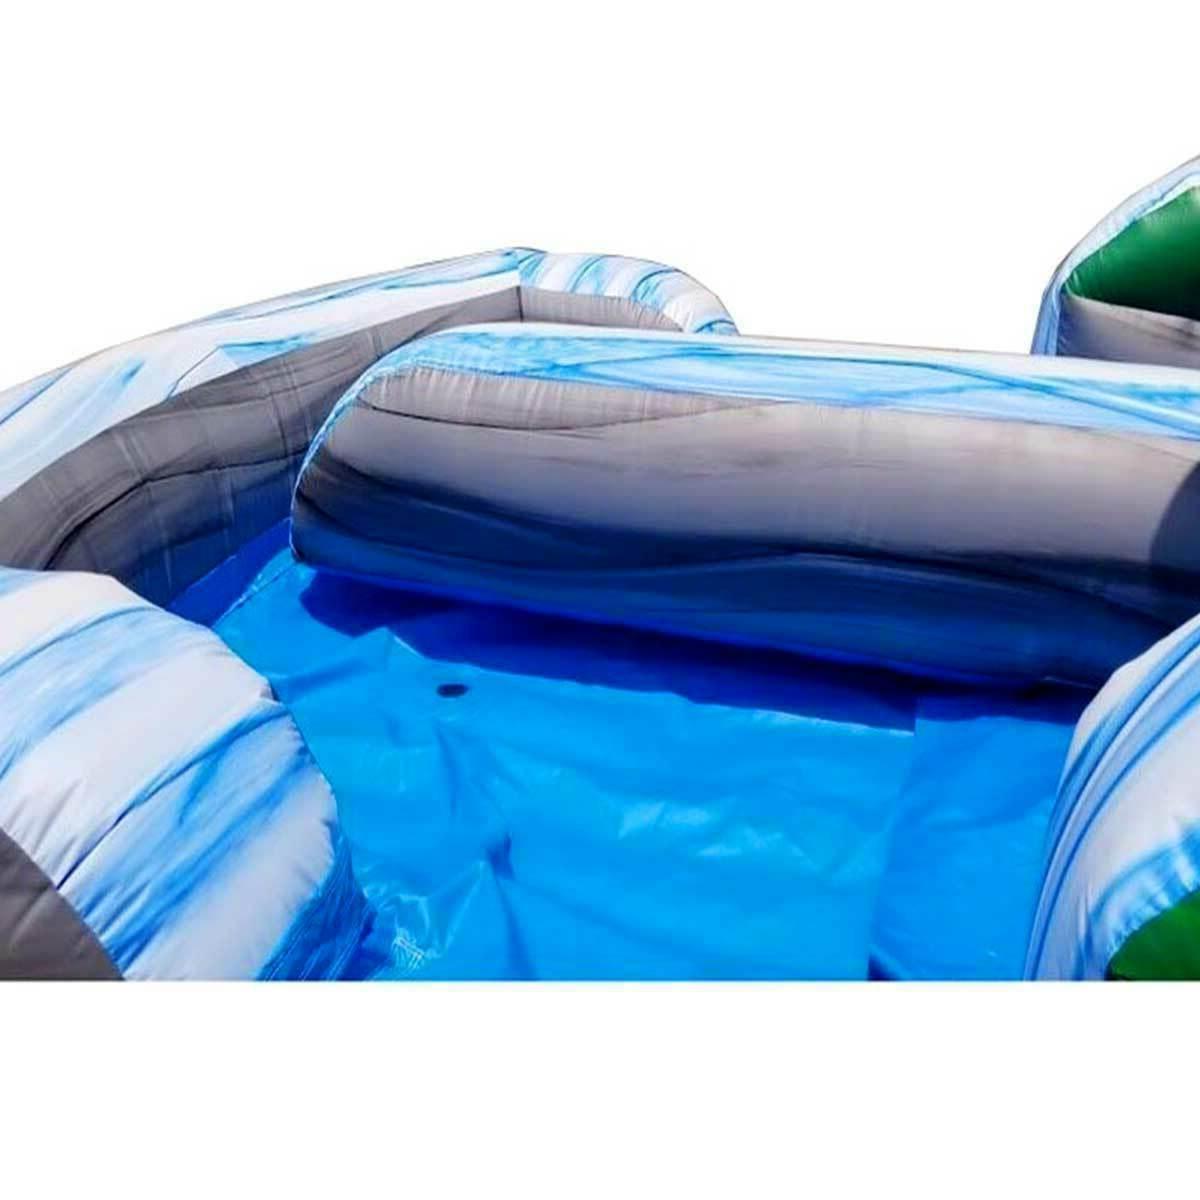 Tropical Commercial n Slide Lane Water Blower 35'L